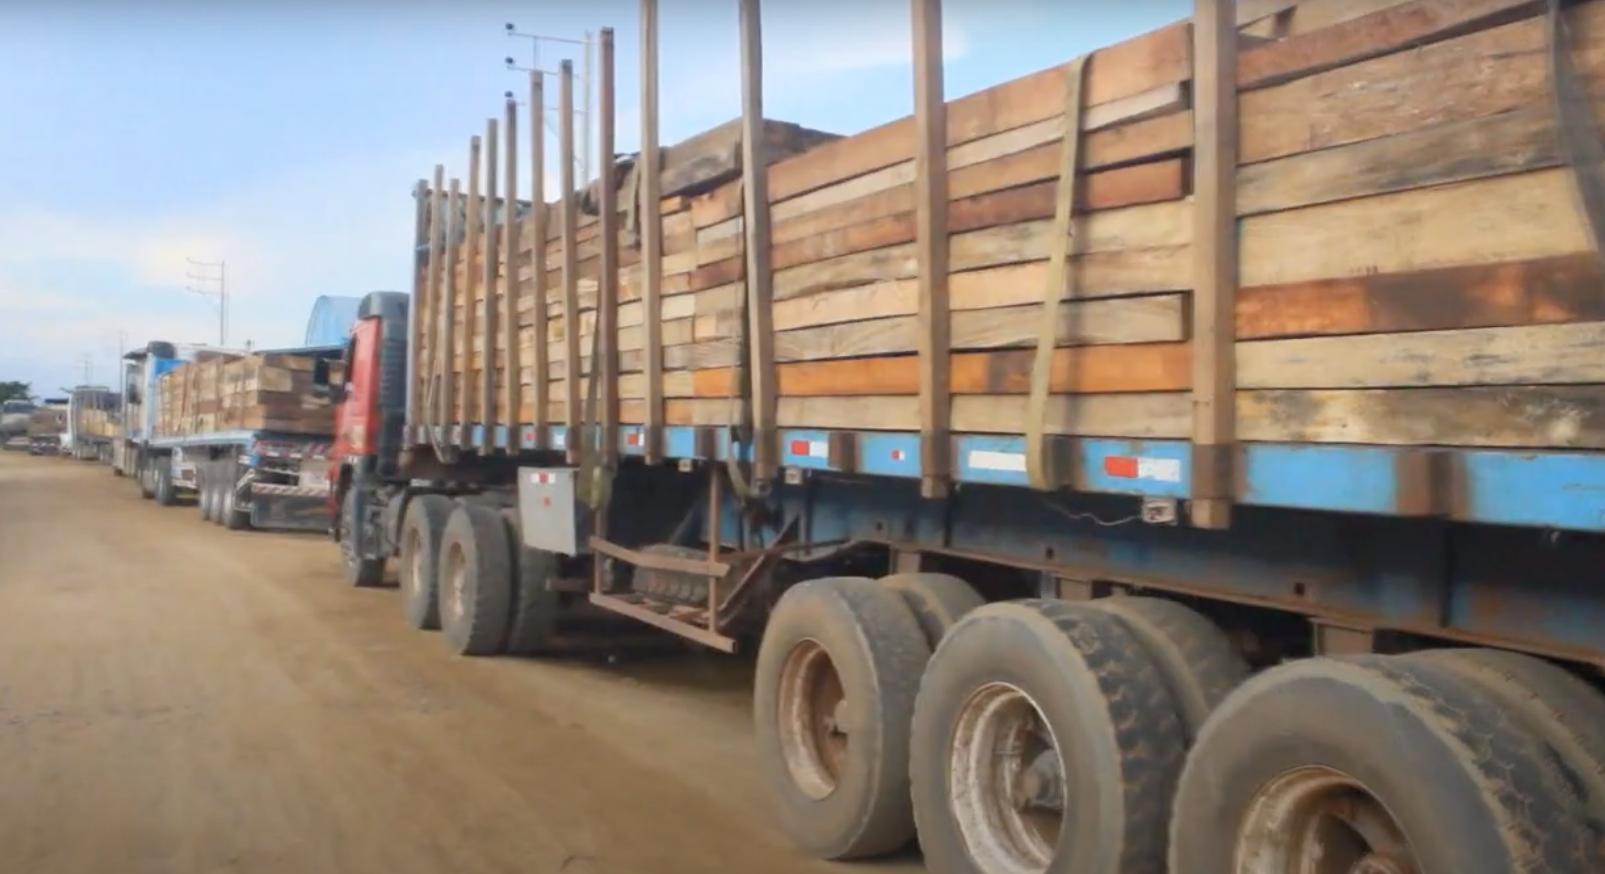 23m3 of lumber seized in Puerto Maldonado